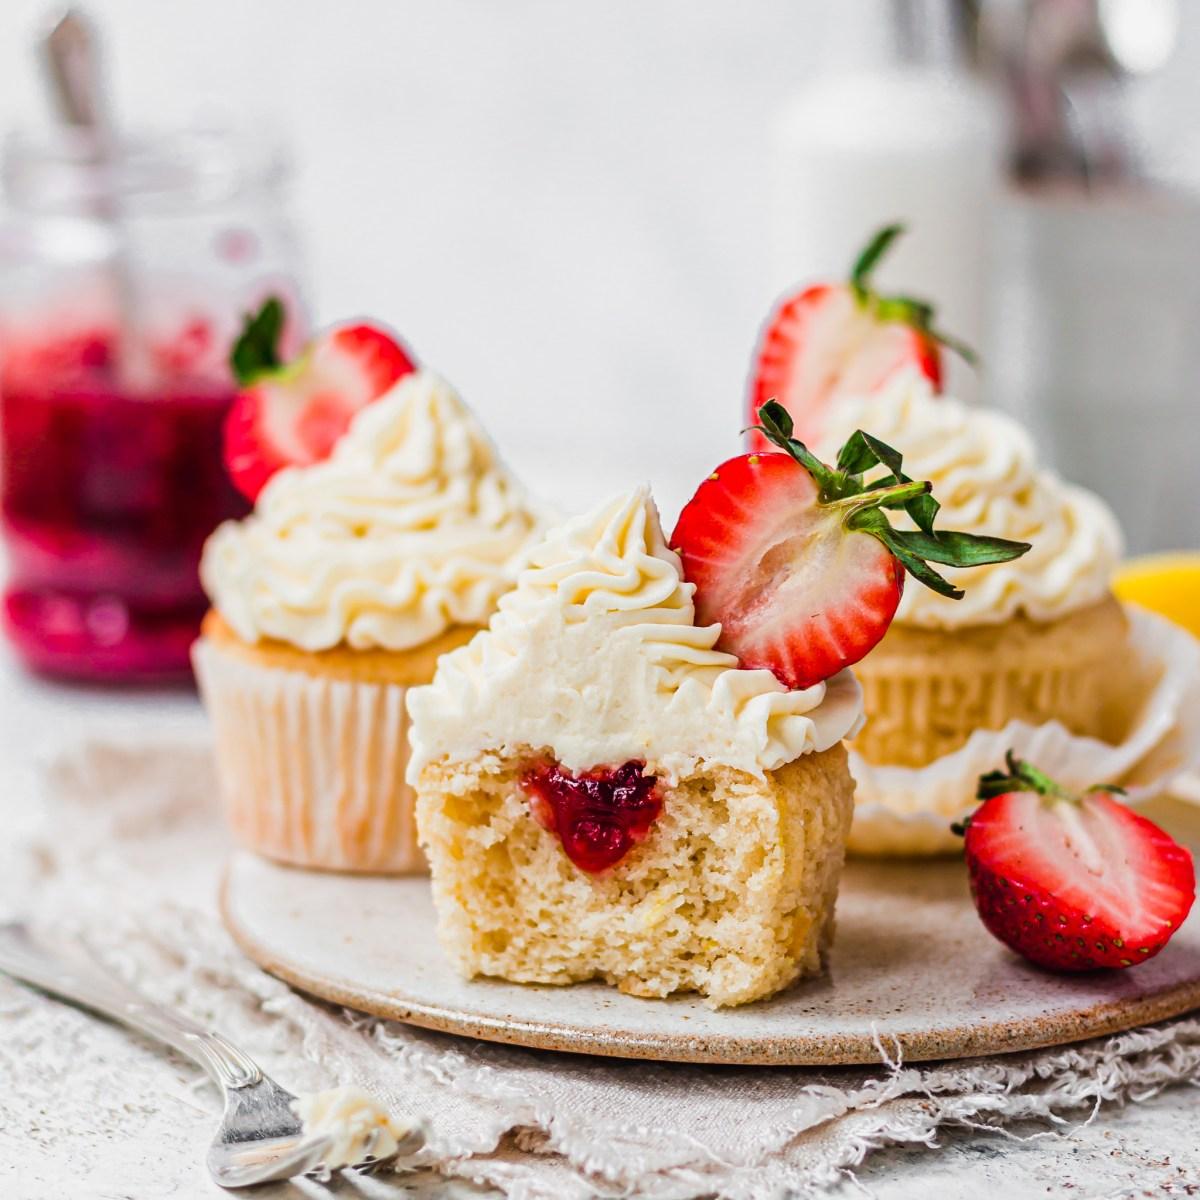 Vegan Lemon Strawberry Cupcakes